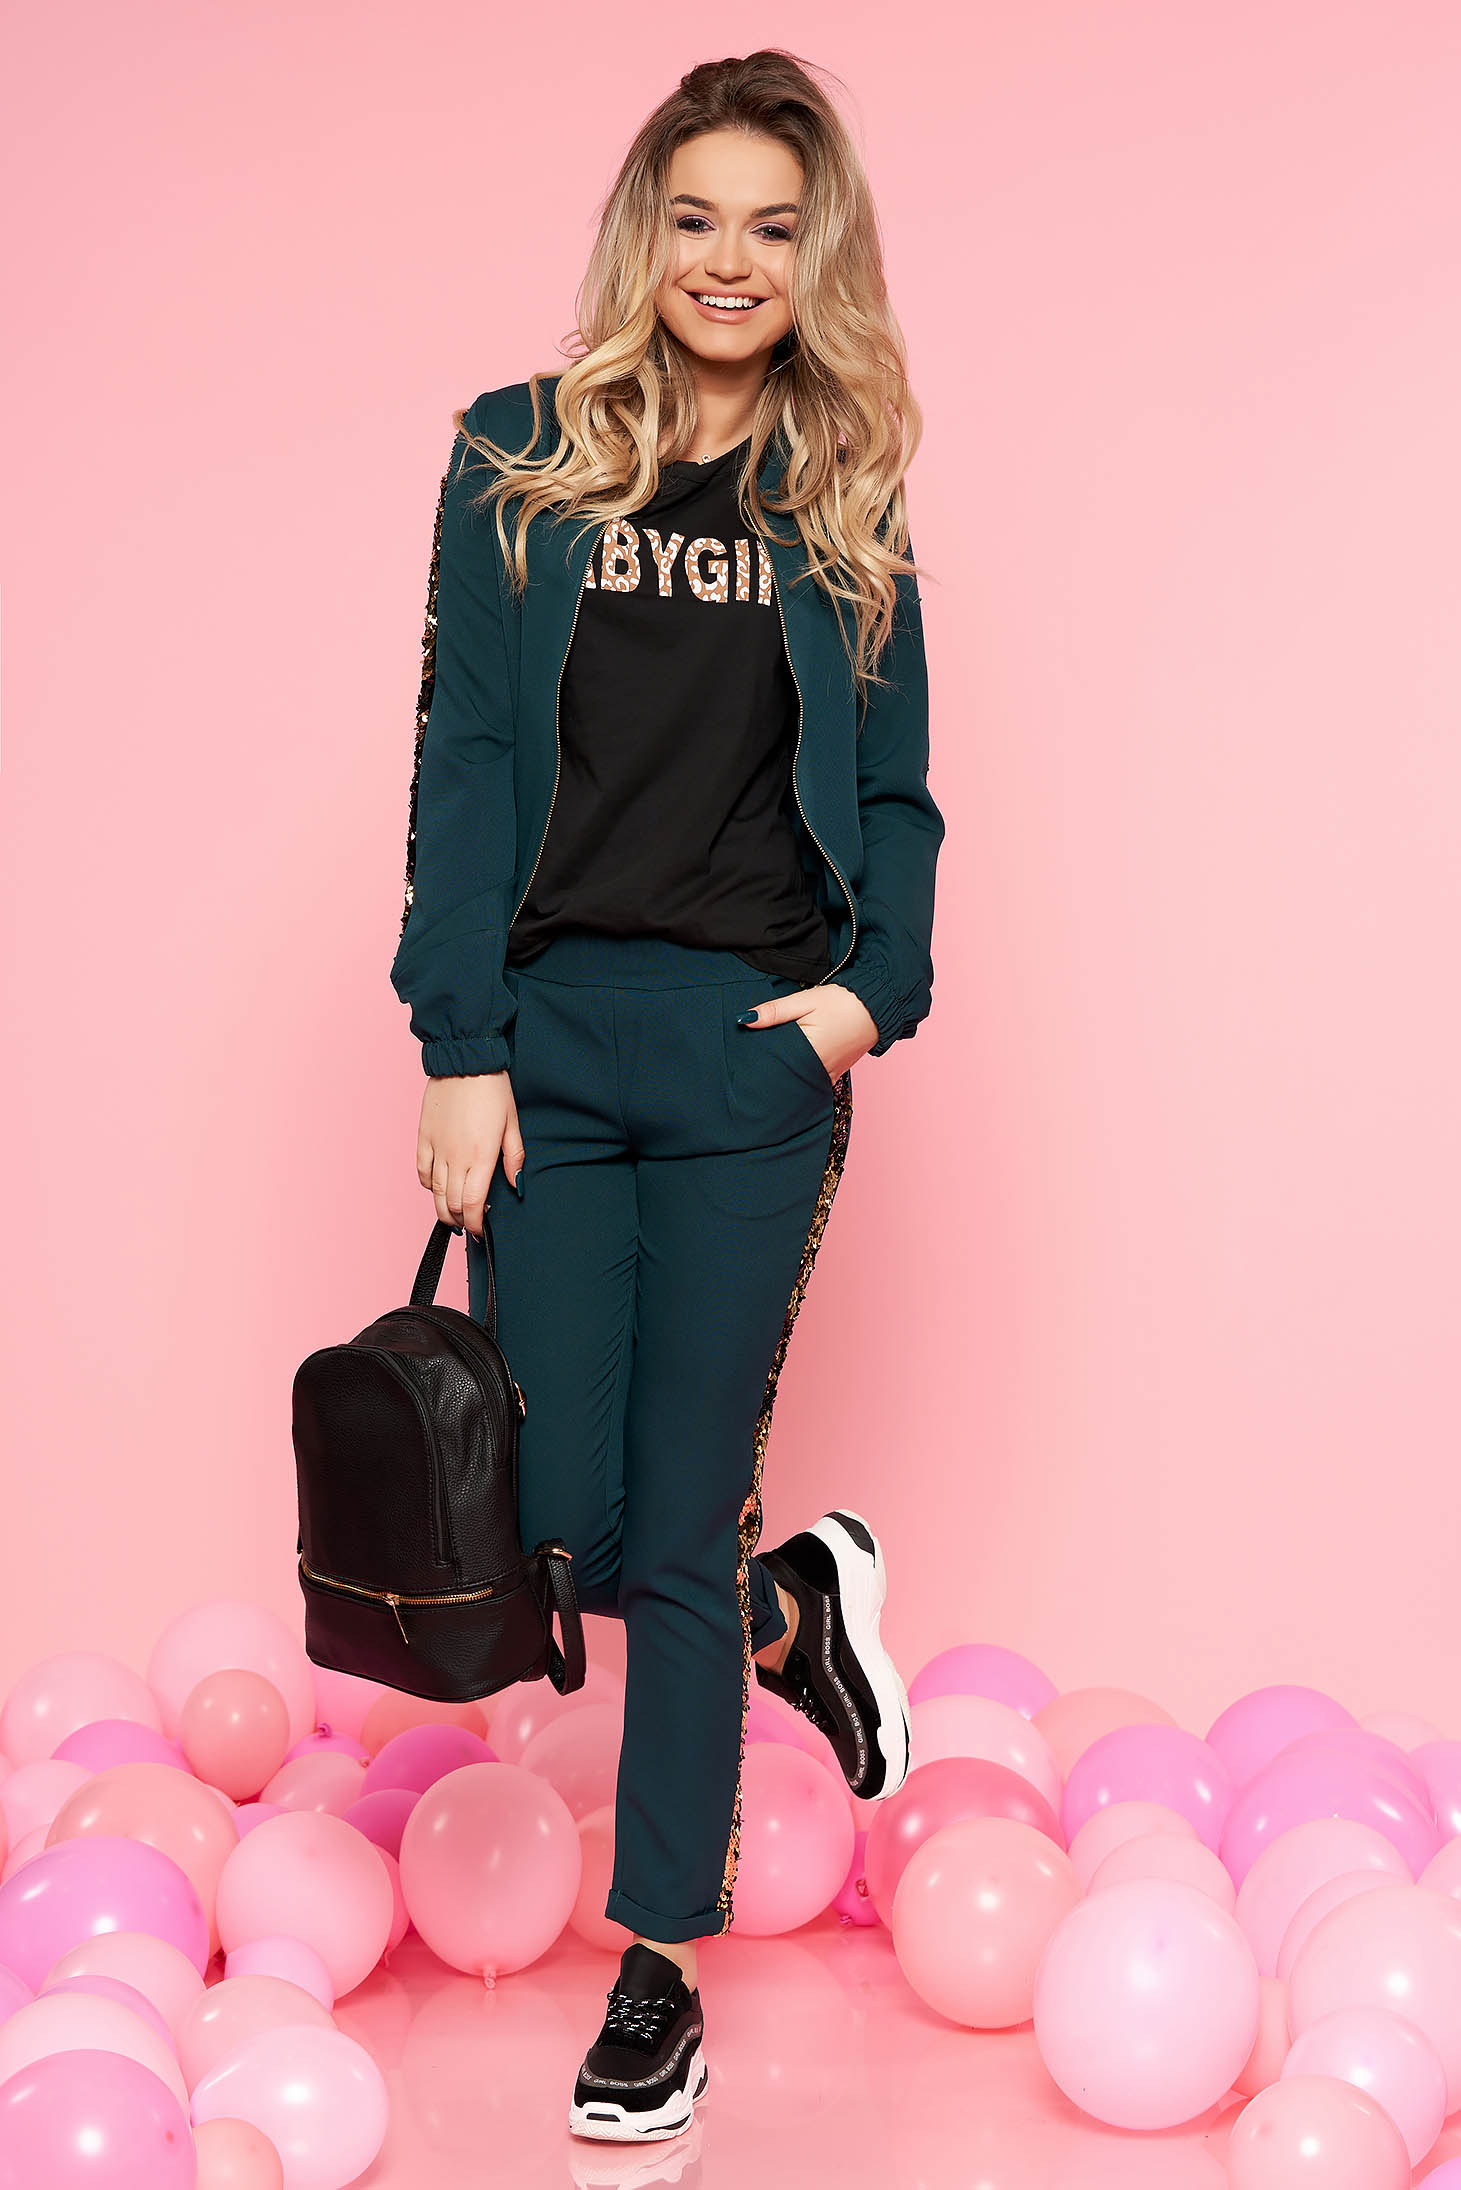 SunShine darkgreen set casual slightly elastic cotton with sequin embellished details with pockets